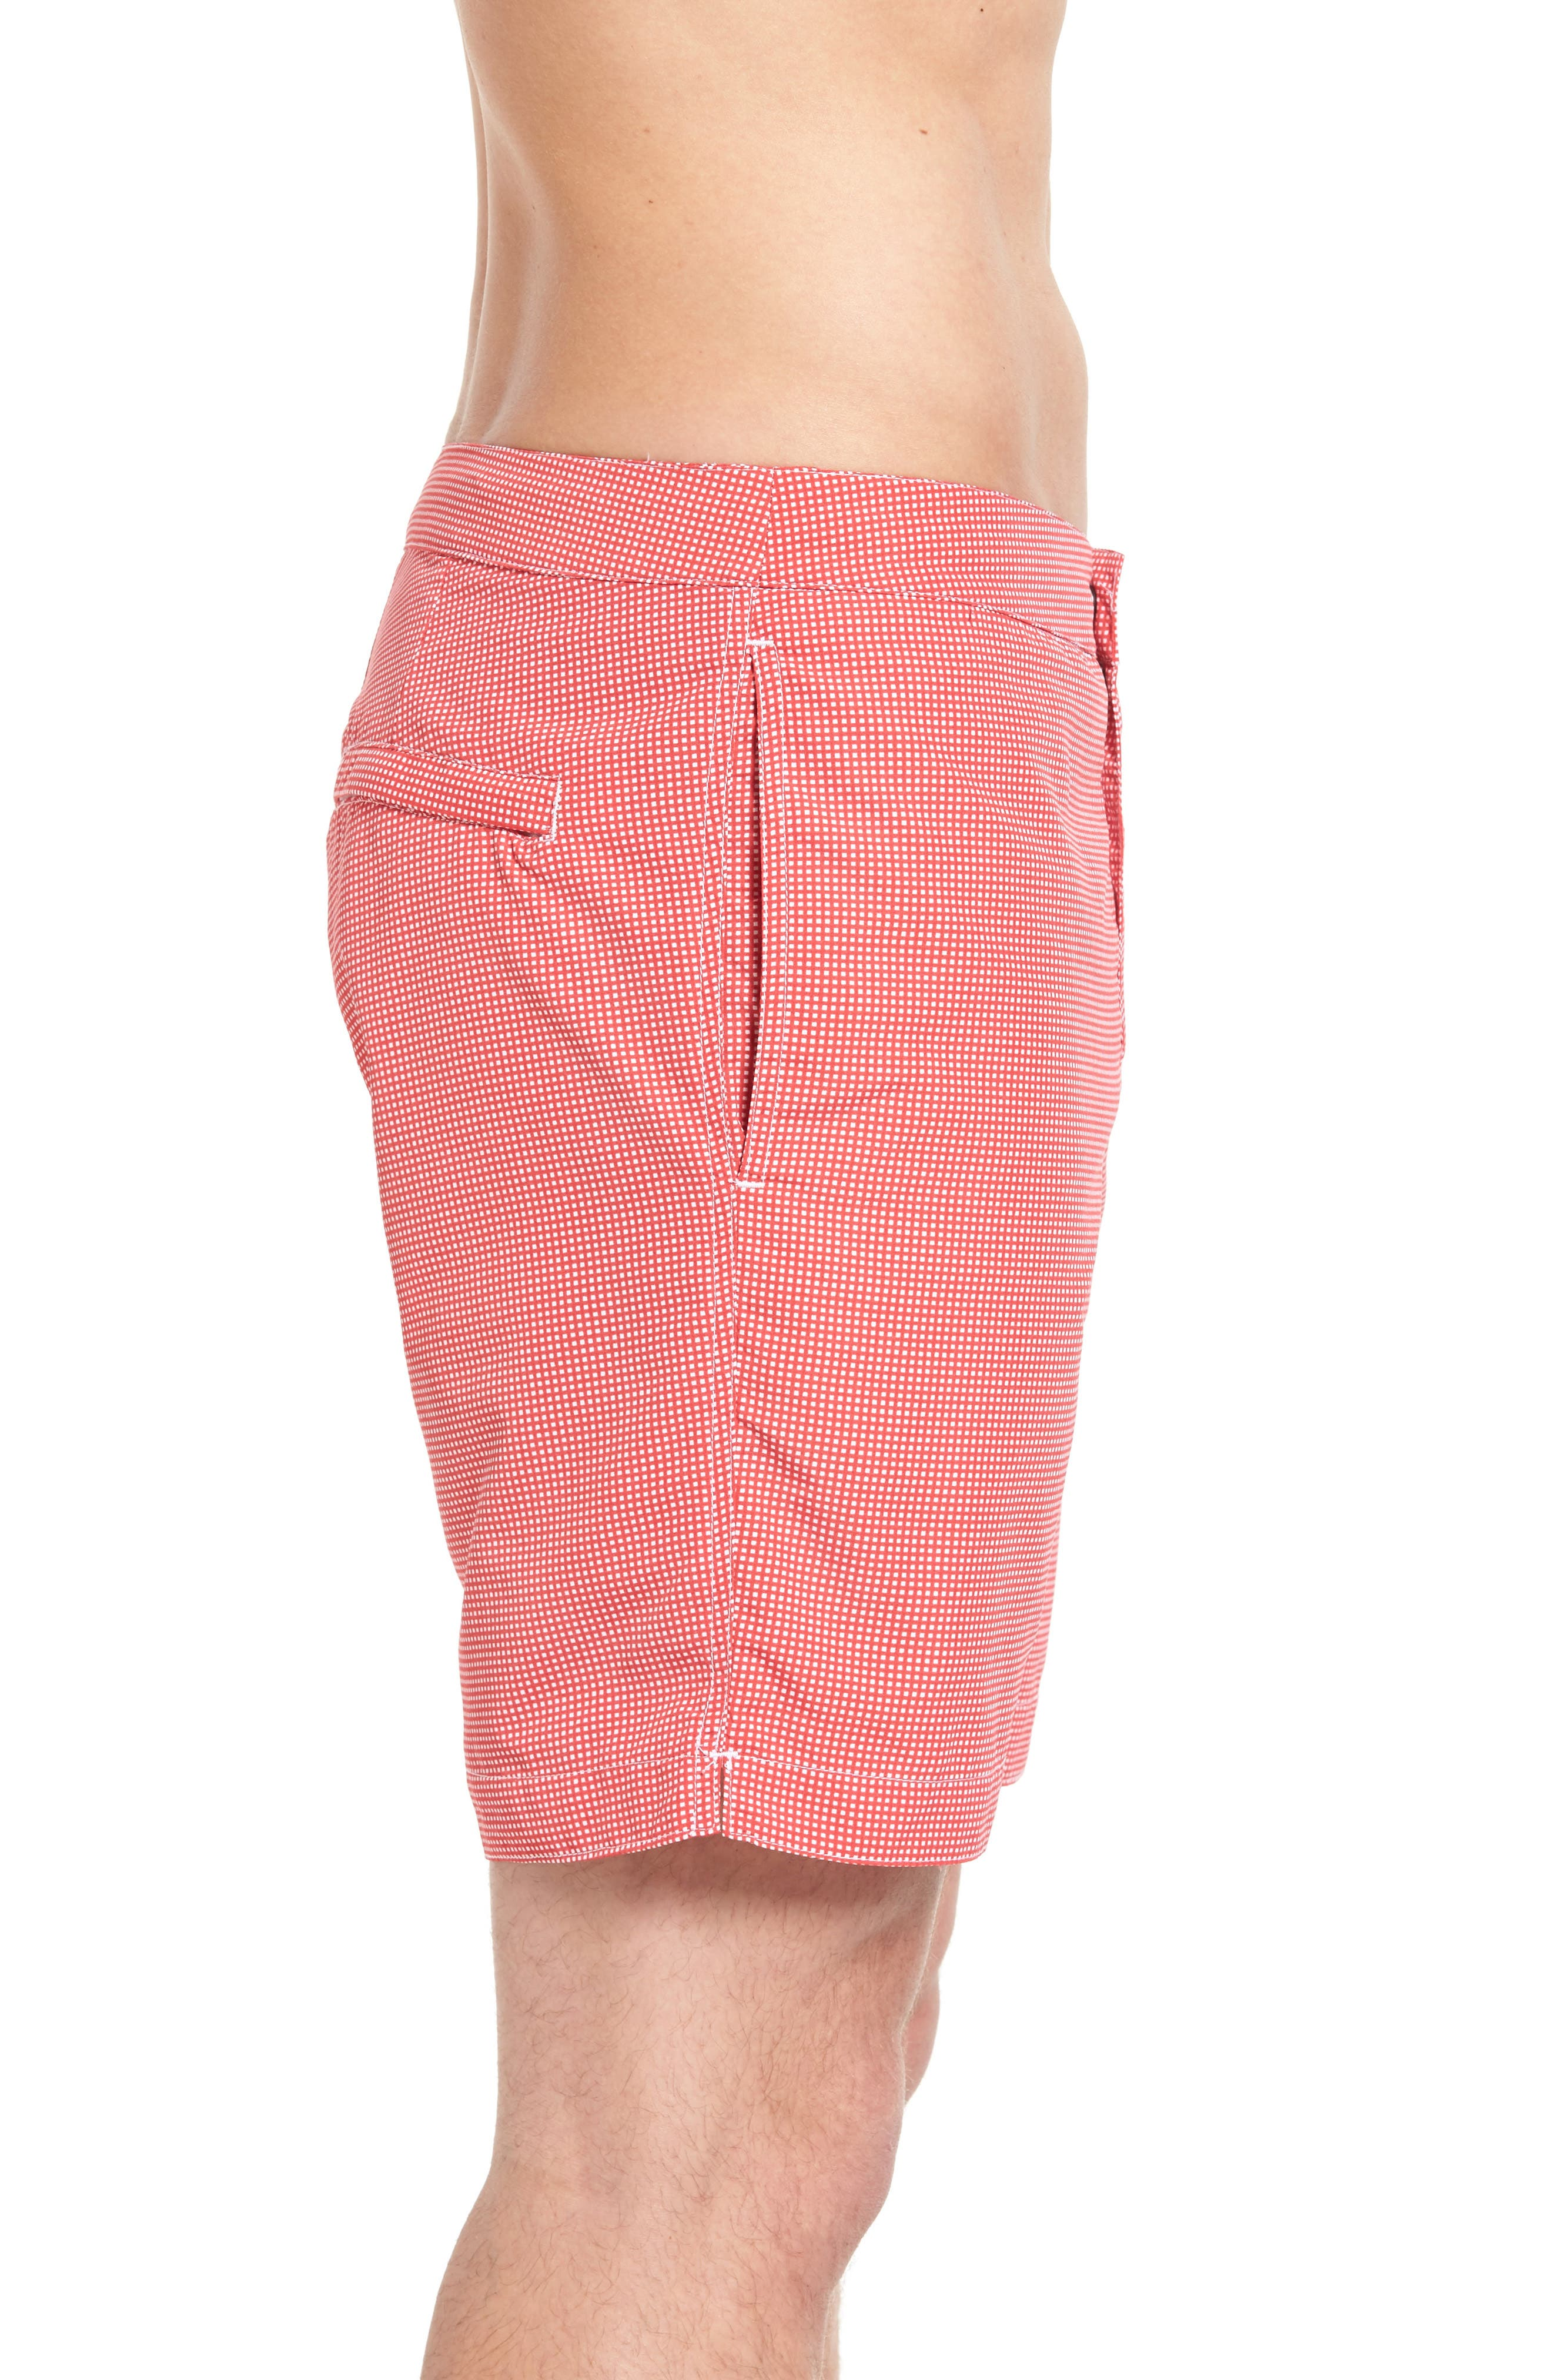 Aruba Microcheck Tailored Fit 8.5 Inch Swim Trunks,                             Alternate thumbnail 3, color,                             611